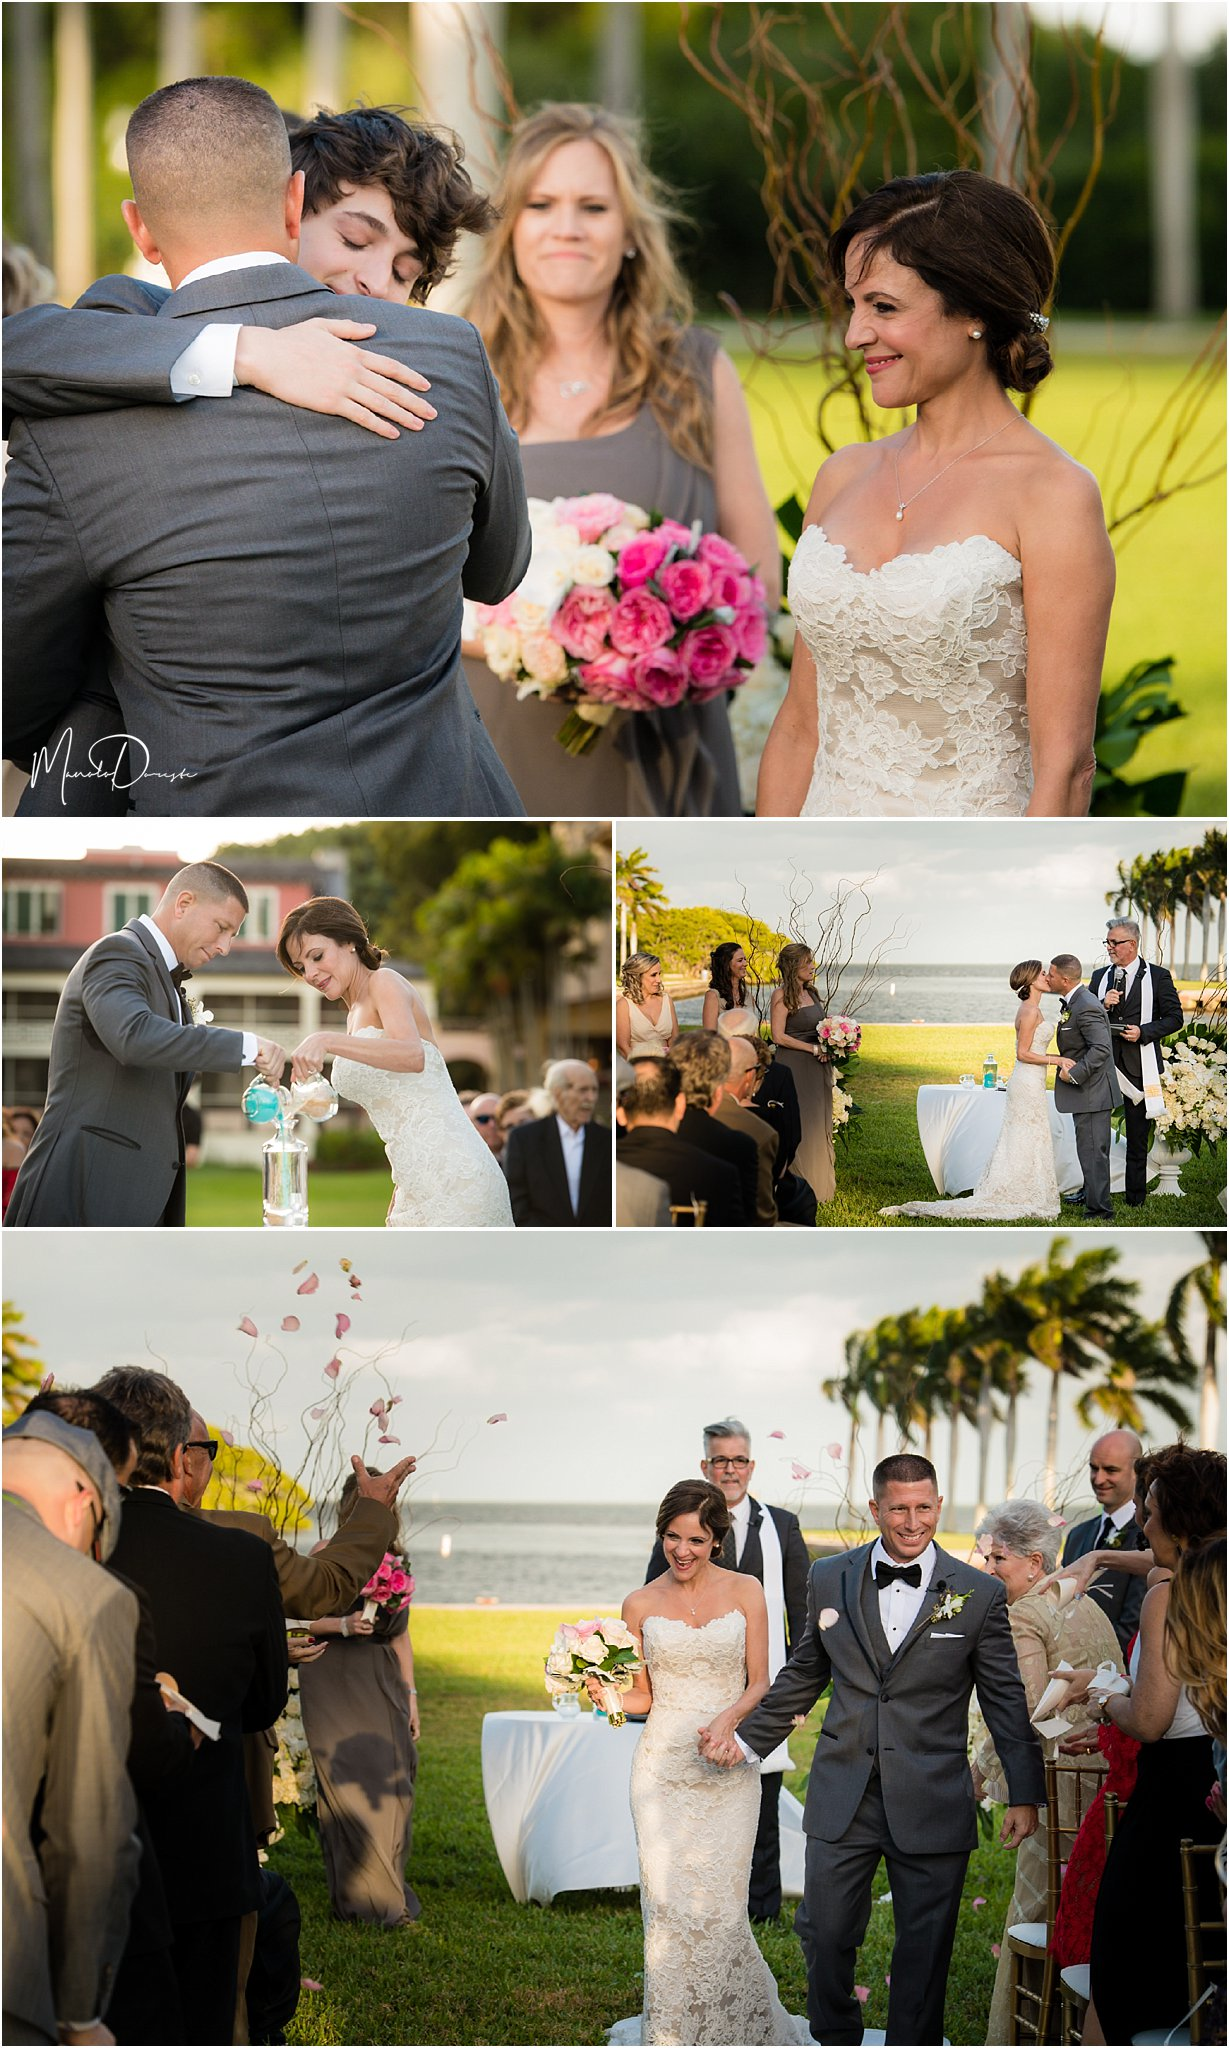 00841_ManoloDoreste_InFocusStudios_Wedding_Family_Photography_Miami_MiamiPhotographer.jpg